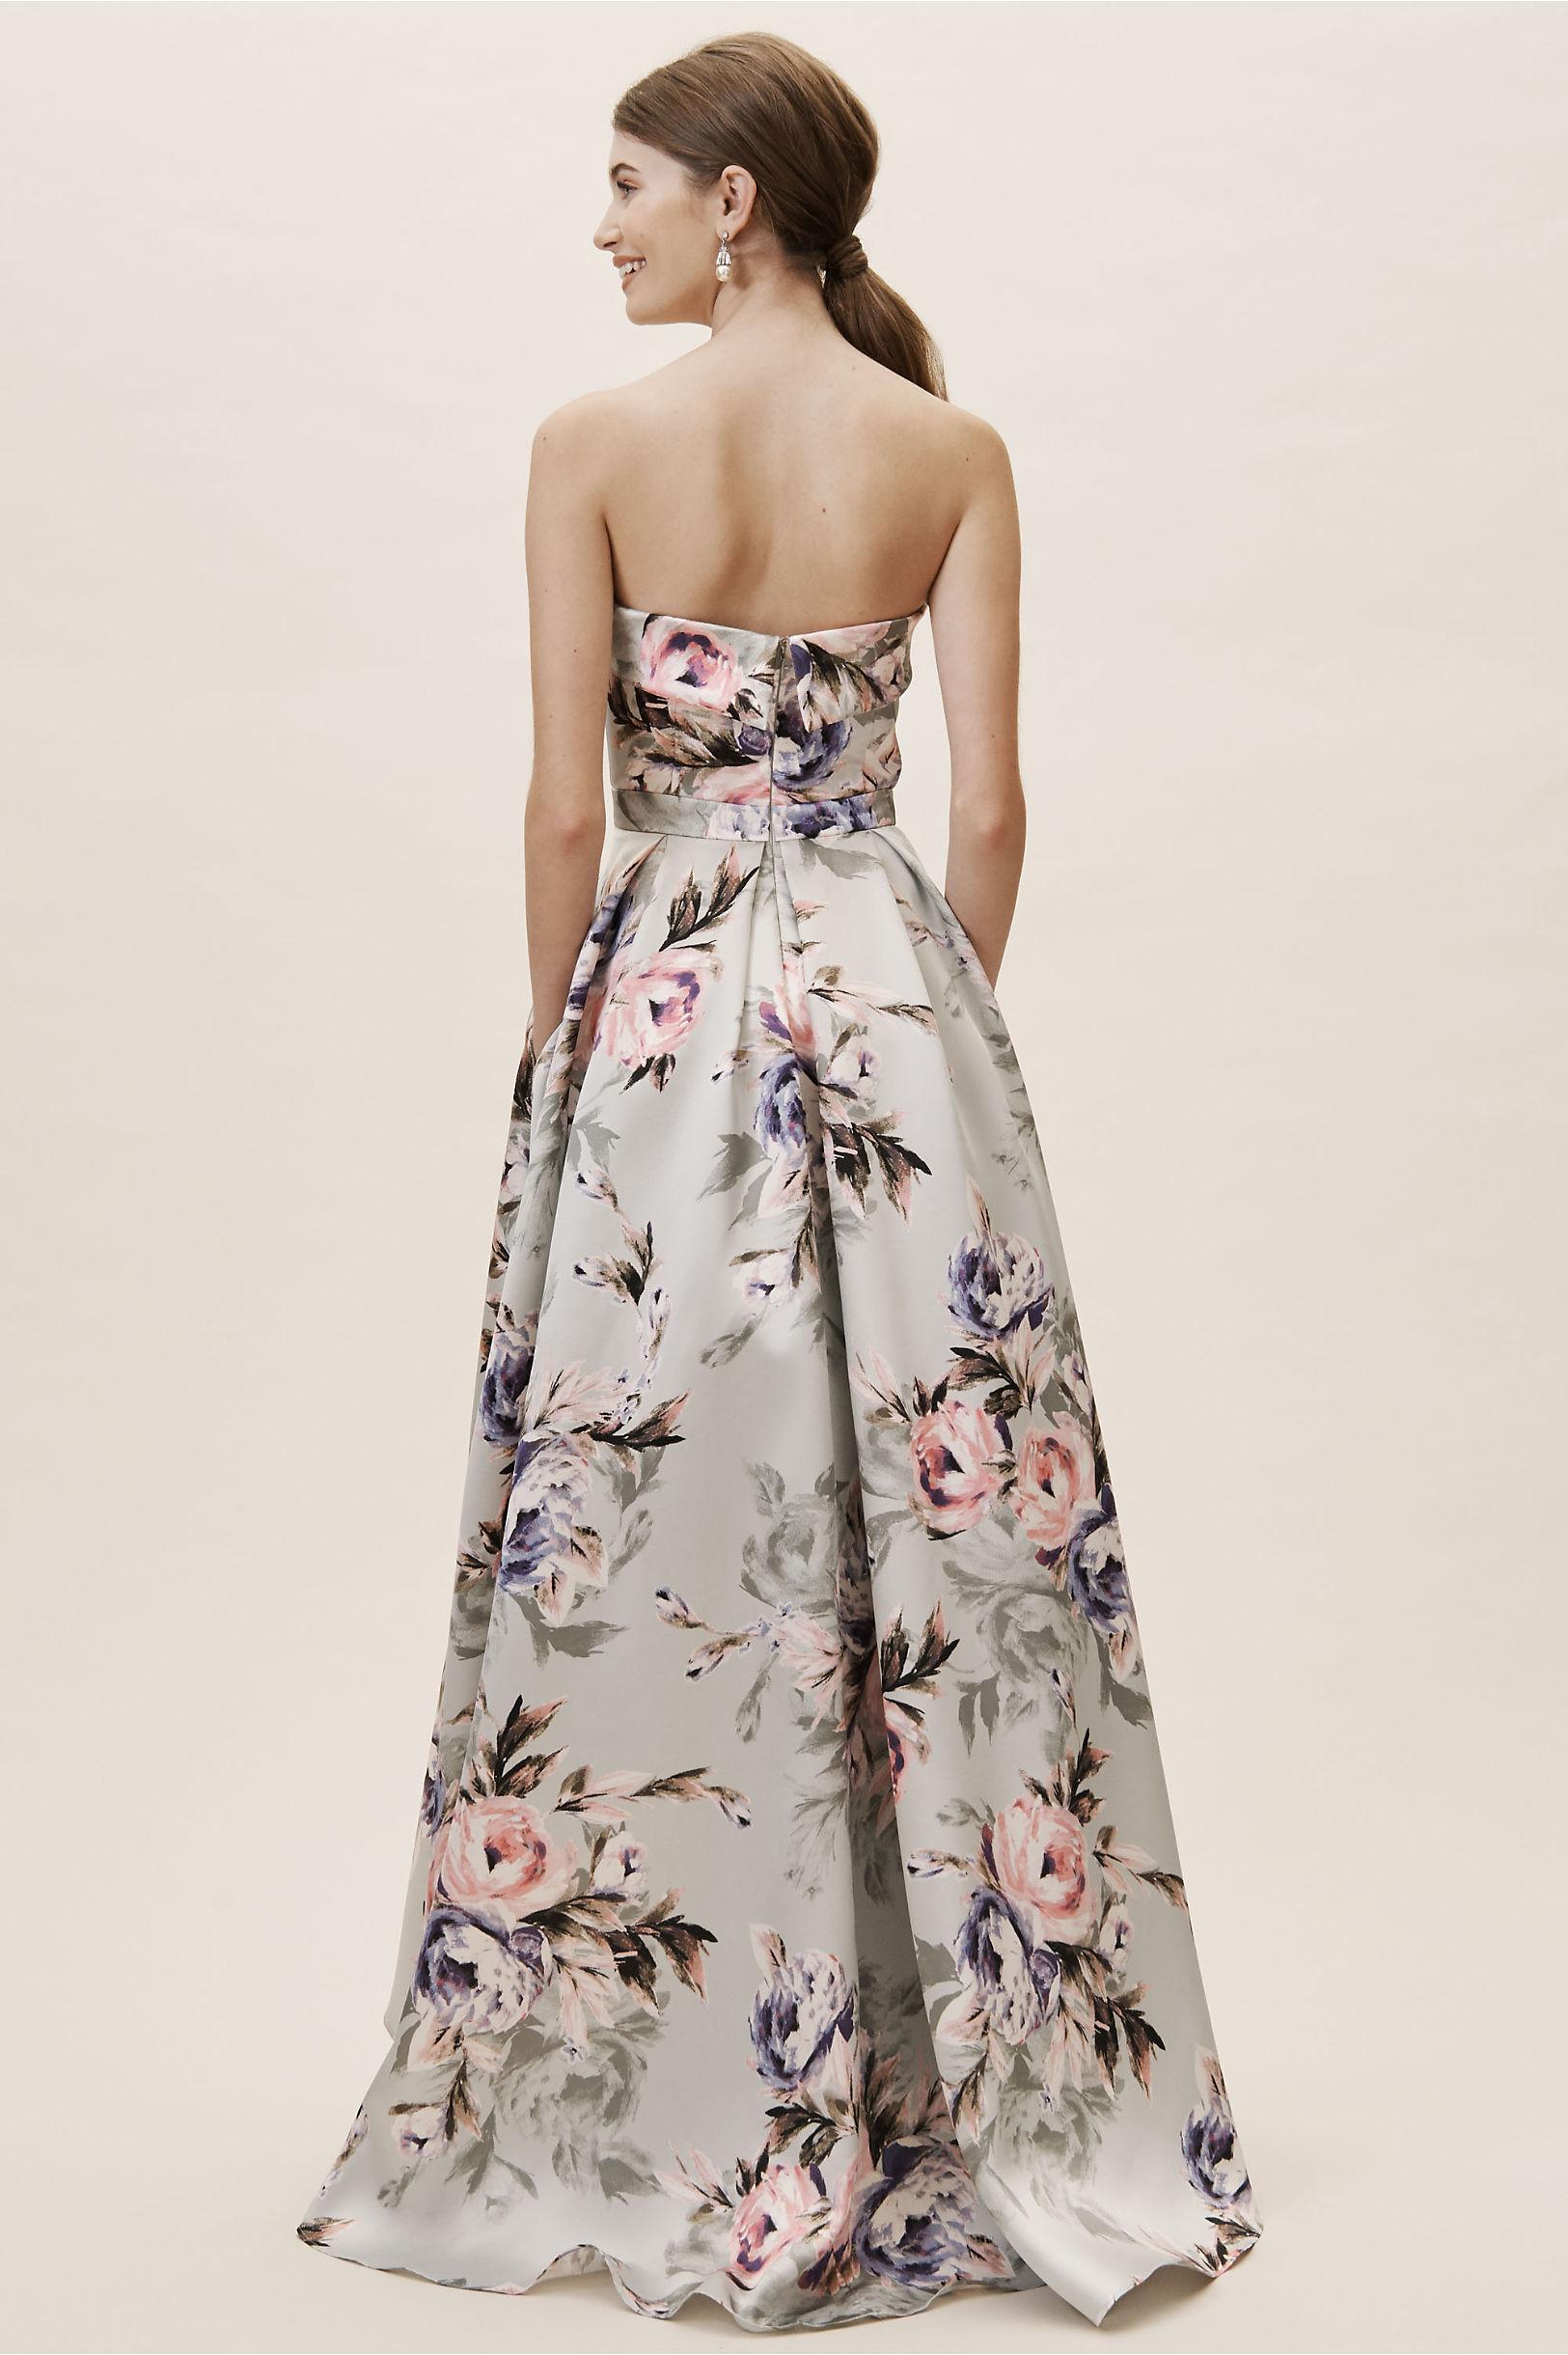 efa31bfda1 Dulcie Dress Sage Lavender in Formal Dresses